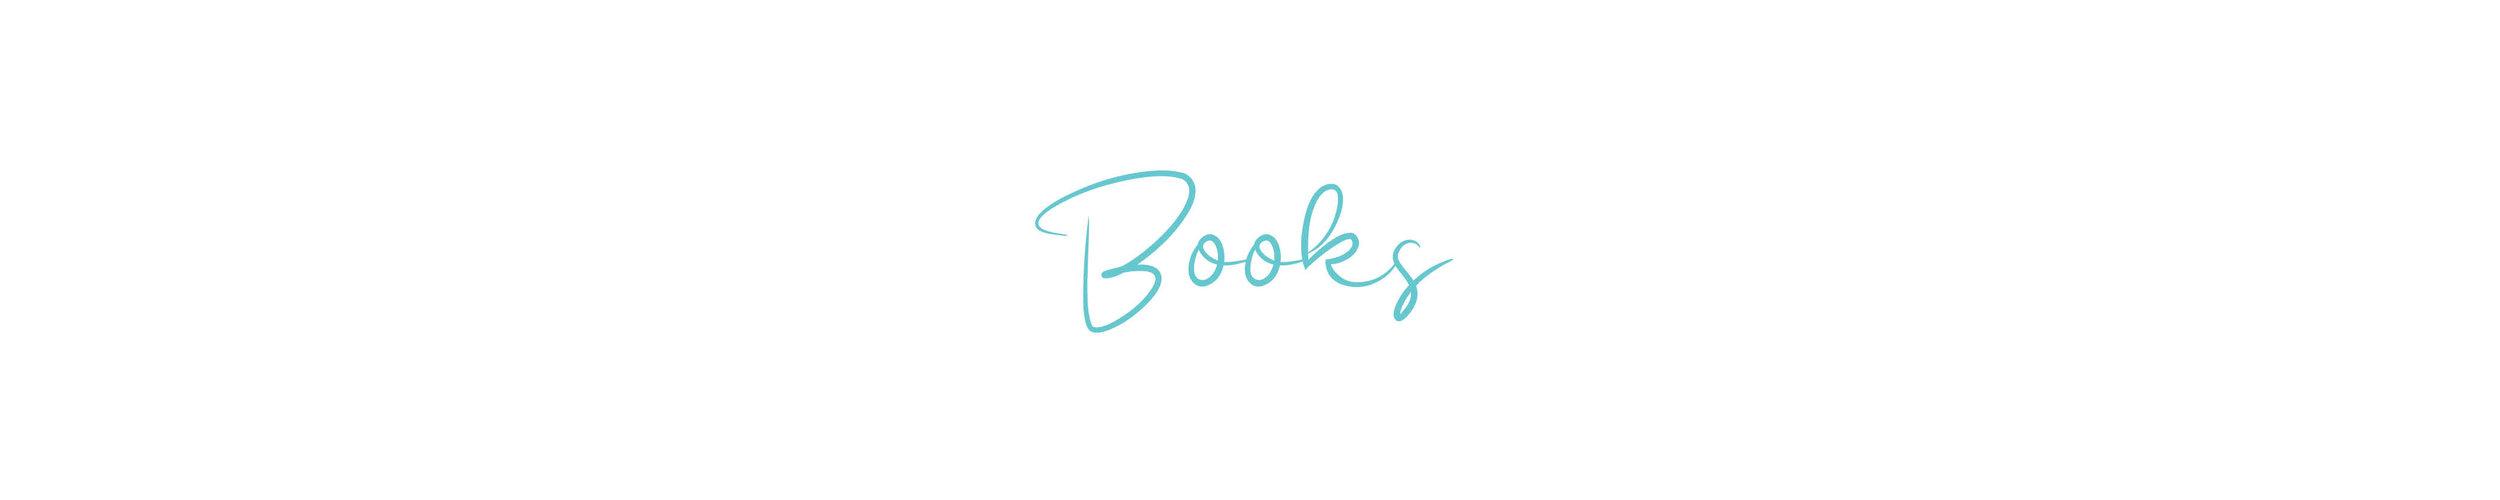 books-inverse-banner.jpg